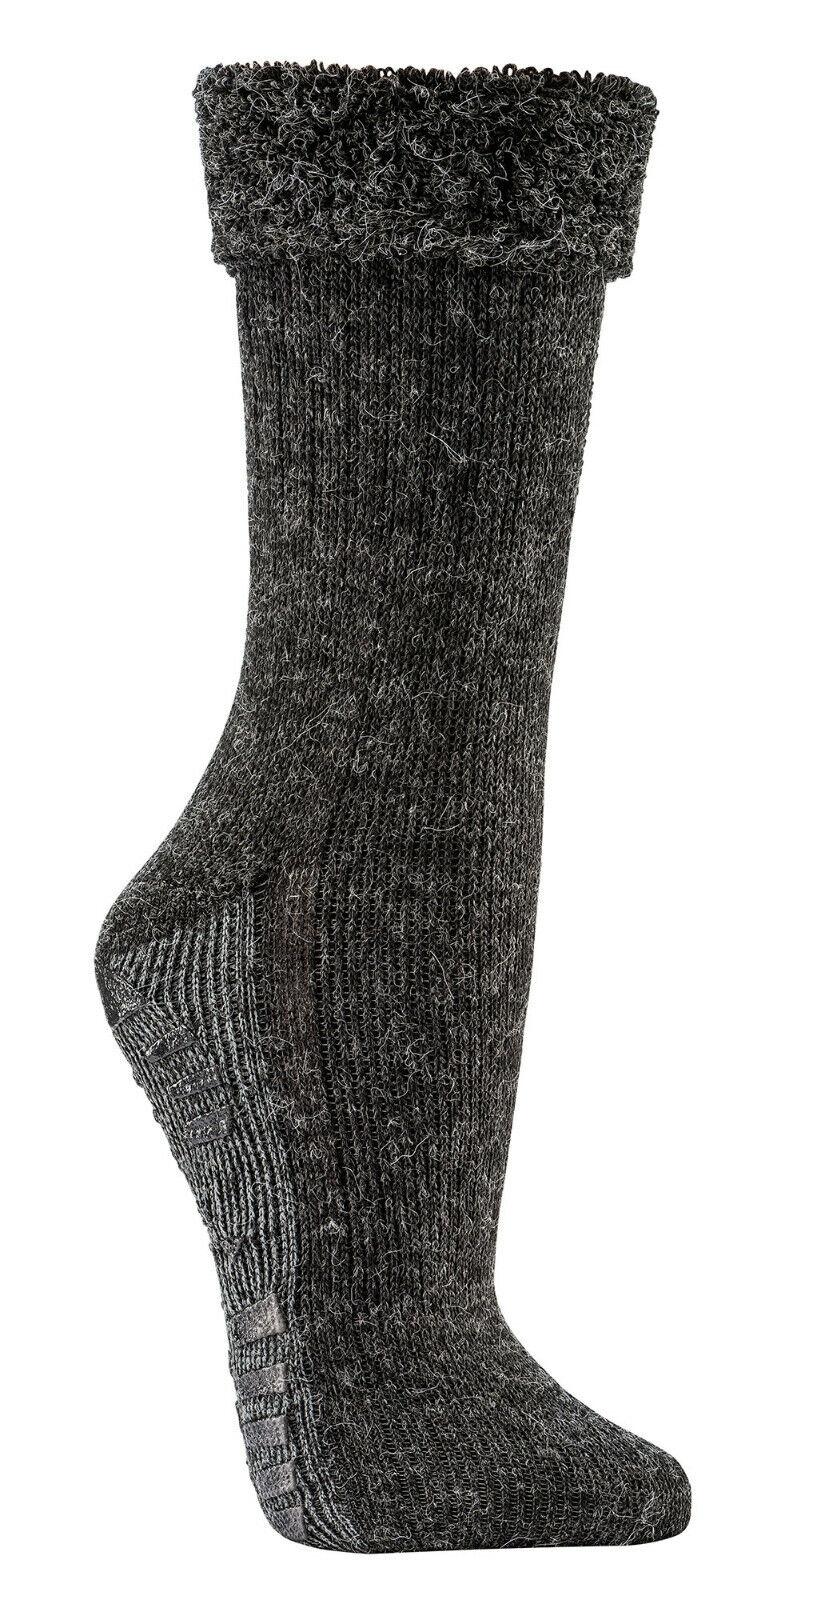 2 Paar ABS Socken mit Alpaka Wolle extra flauschig gefüttert Homesocks Bettsocke